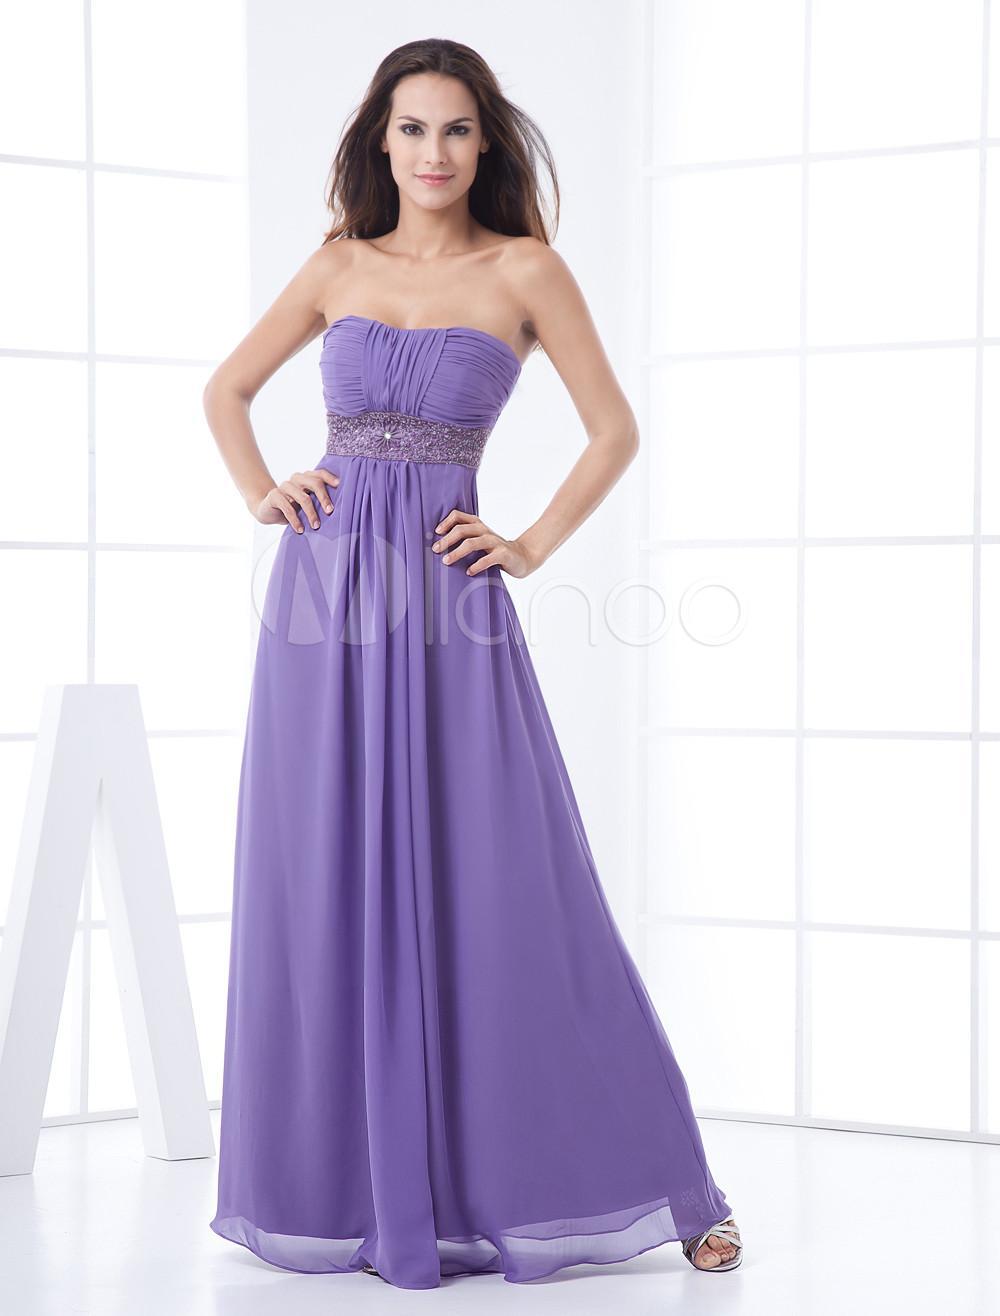 Contemporáneo Damas De Honor Vestidos De Color Lila Reino Unido ...